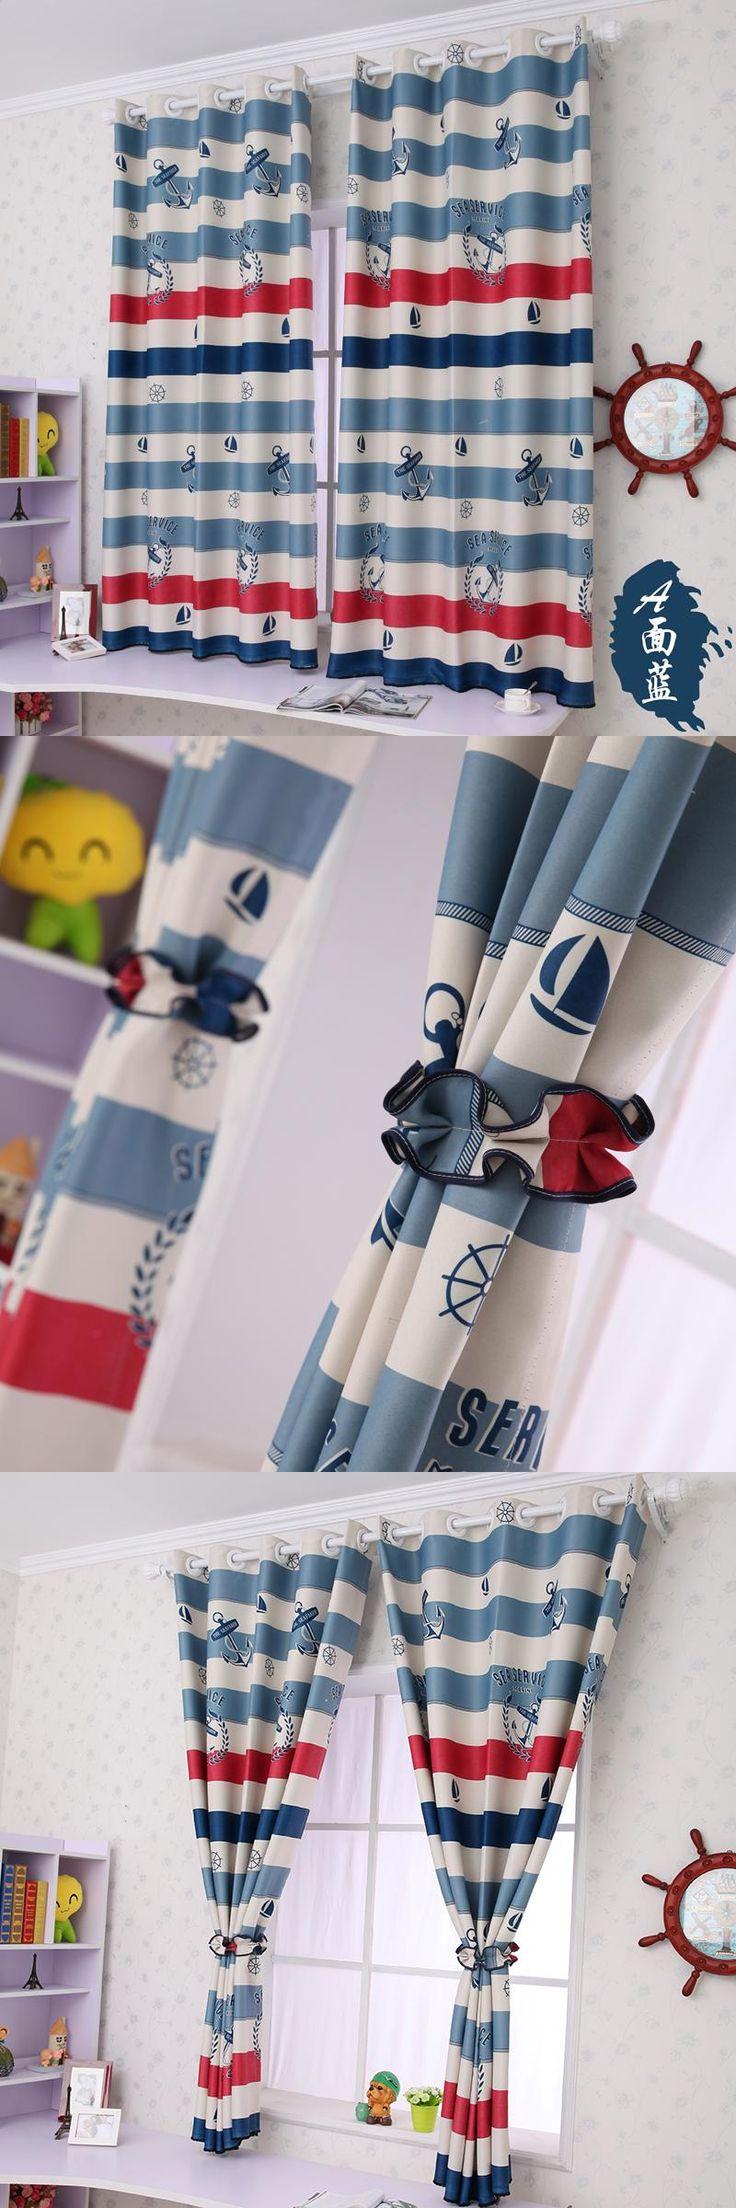 2 Meter Length The Mediterranean Style Of Boyu0027s Bedroom Blackout Curtain